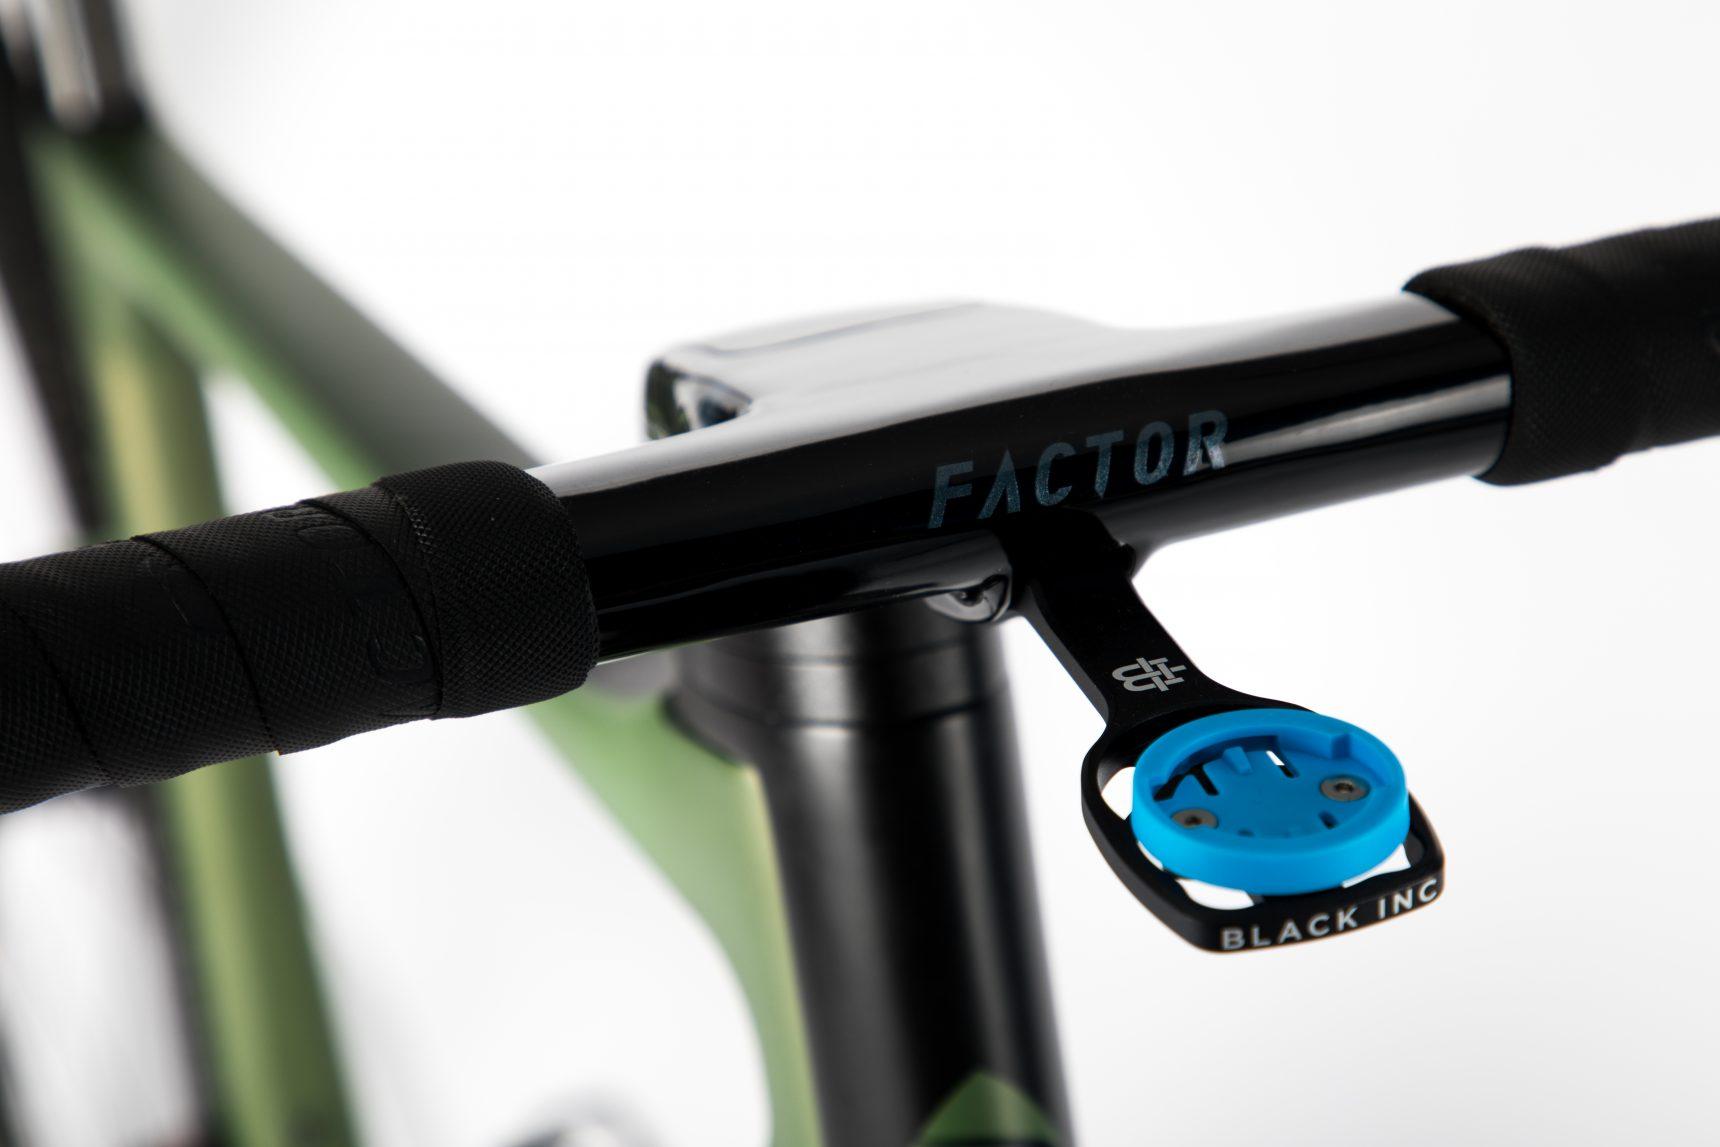 Factor Vista